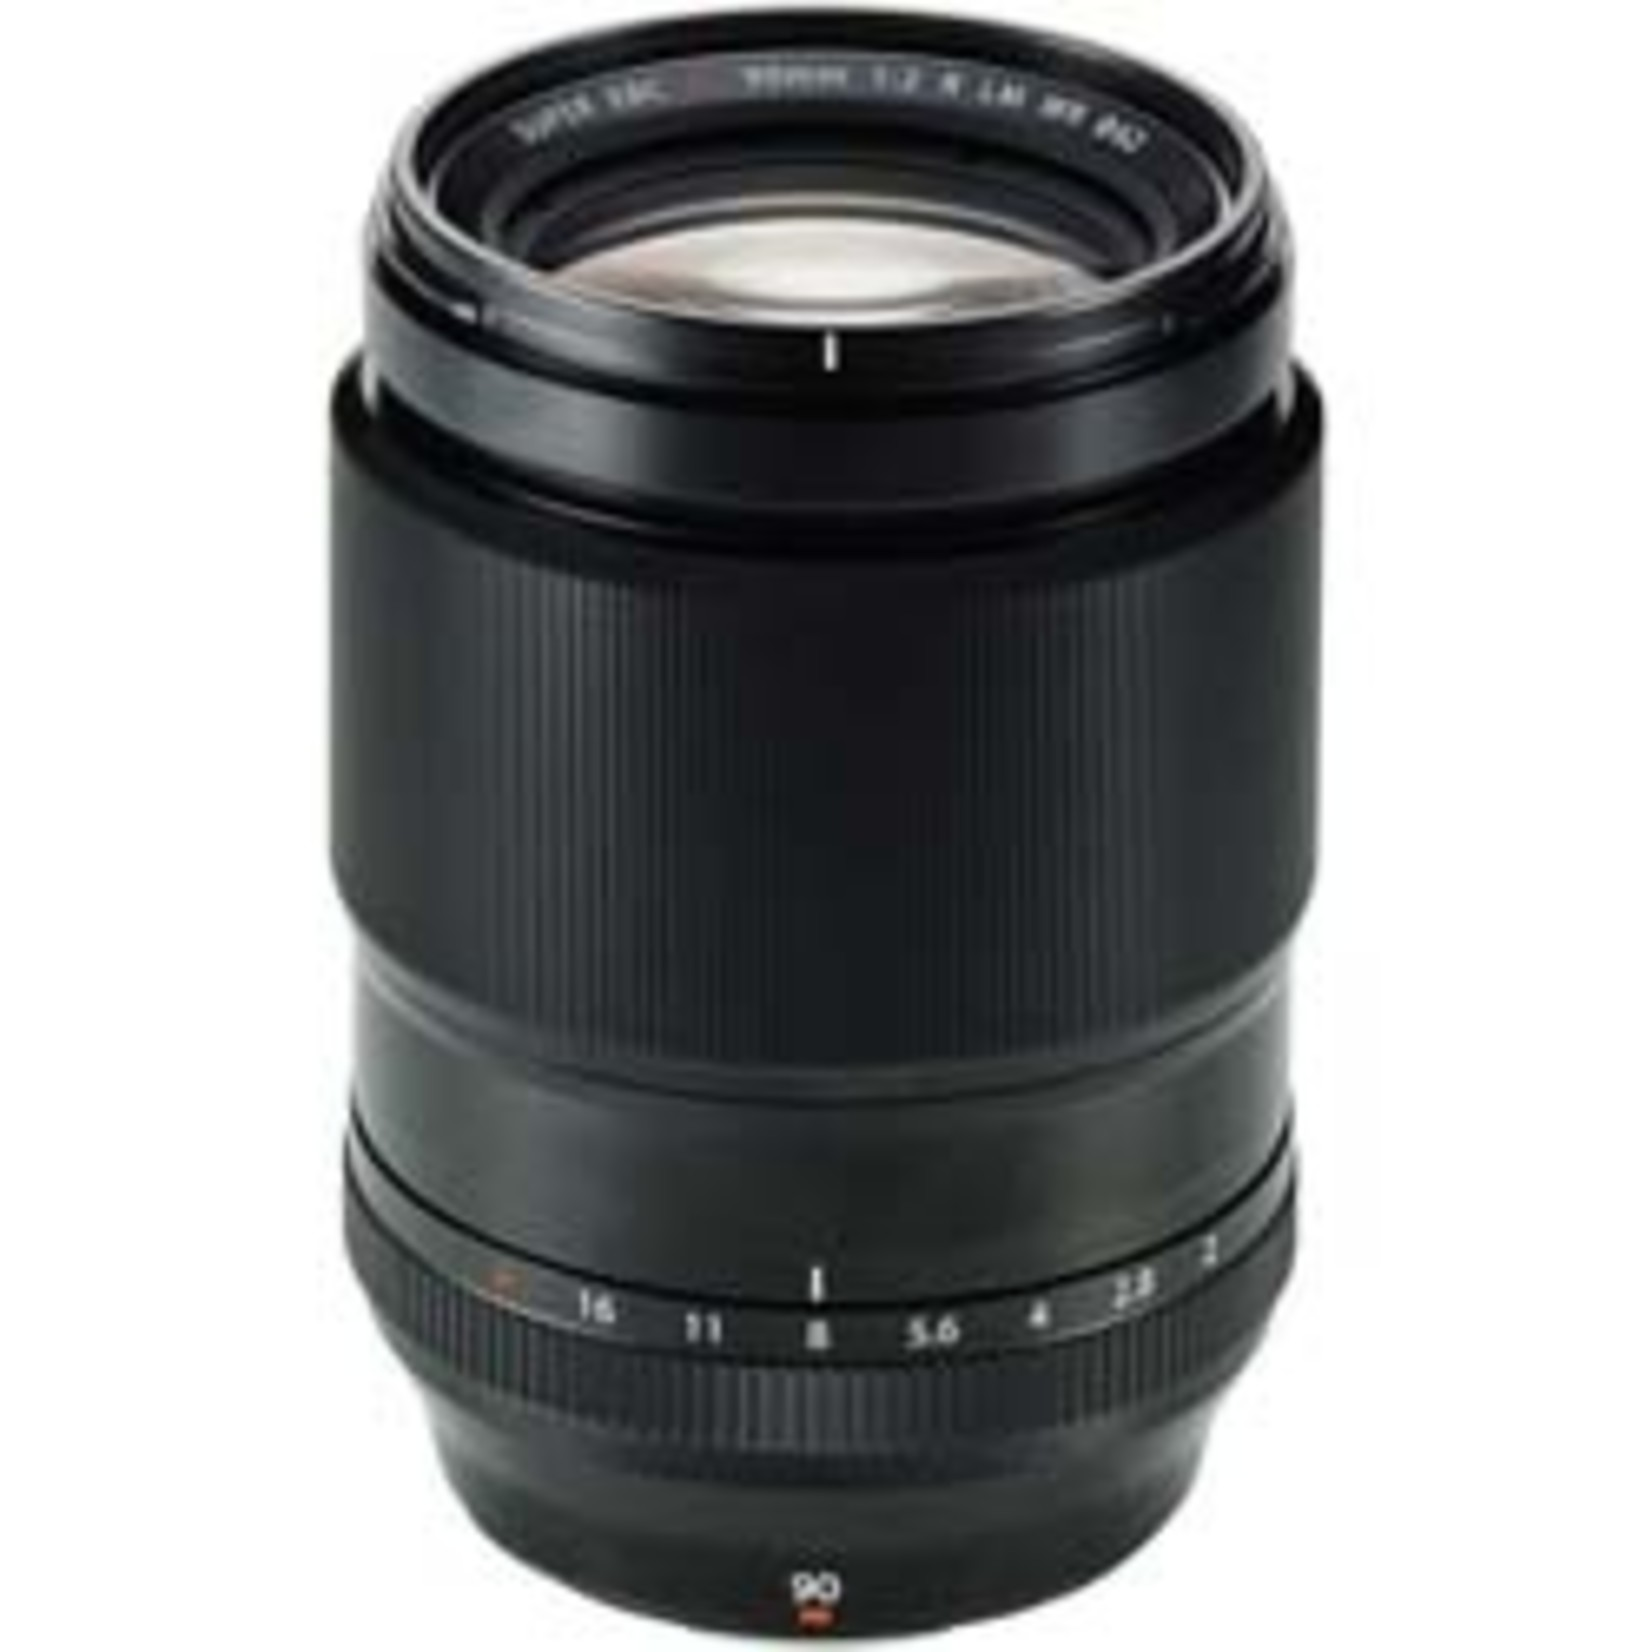 FujiFilm FujiFilm XF 90mm f/2 R LM WR Lens